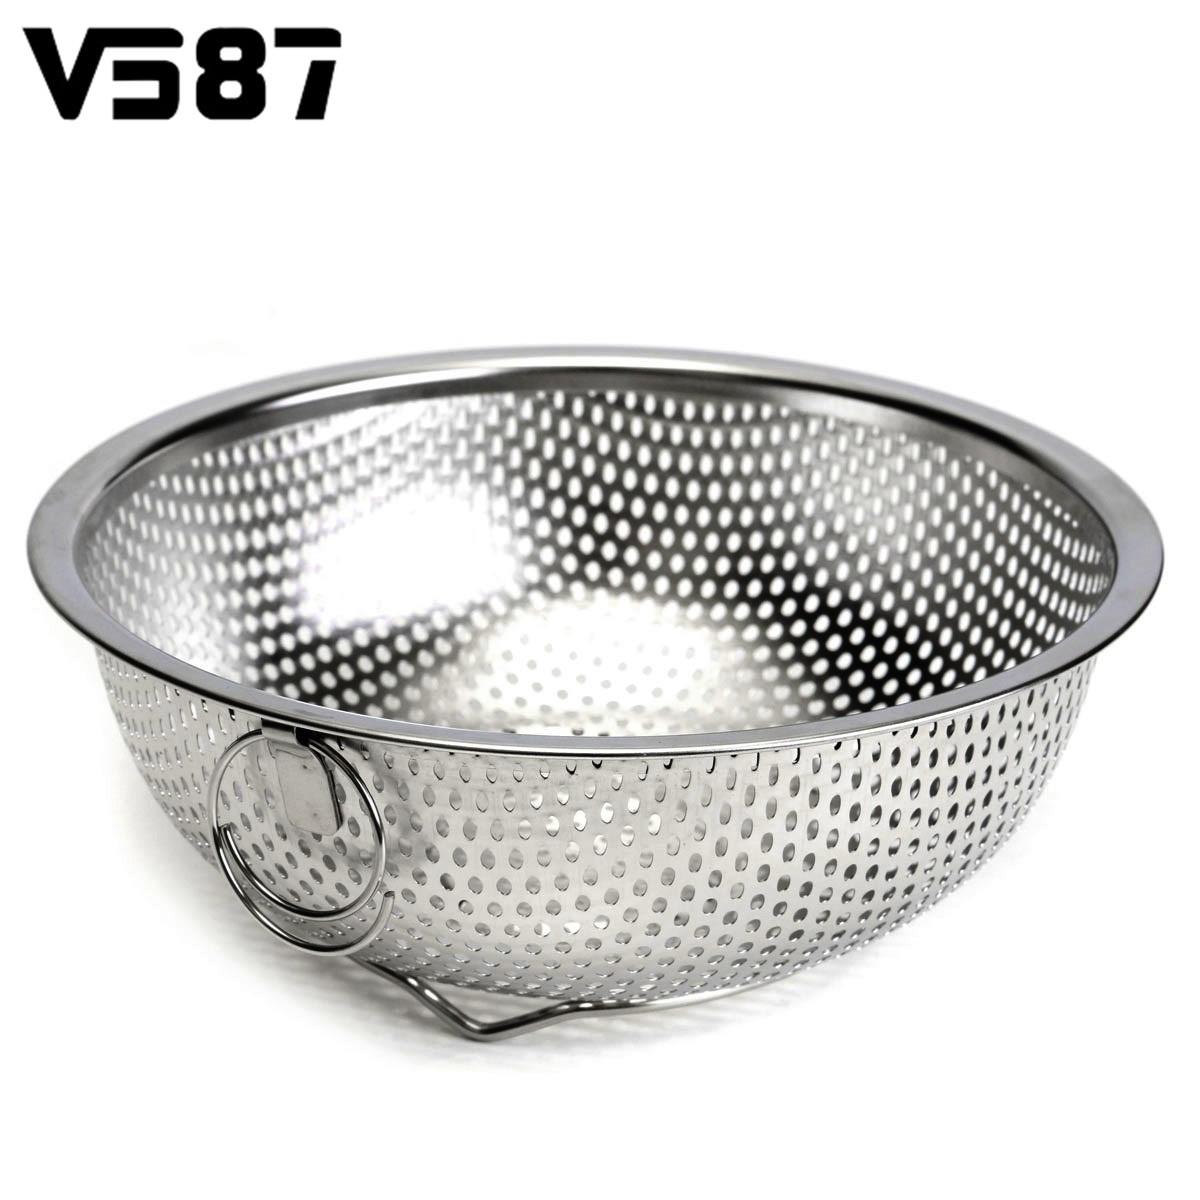 Stainless Steel Sink Colander : Stainless Steel Mesh Fruits Vegetable Basket Sieve Colander Strainer ...